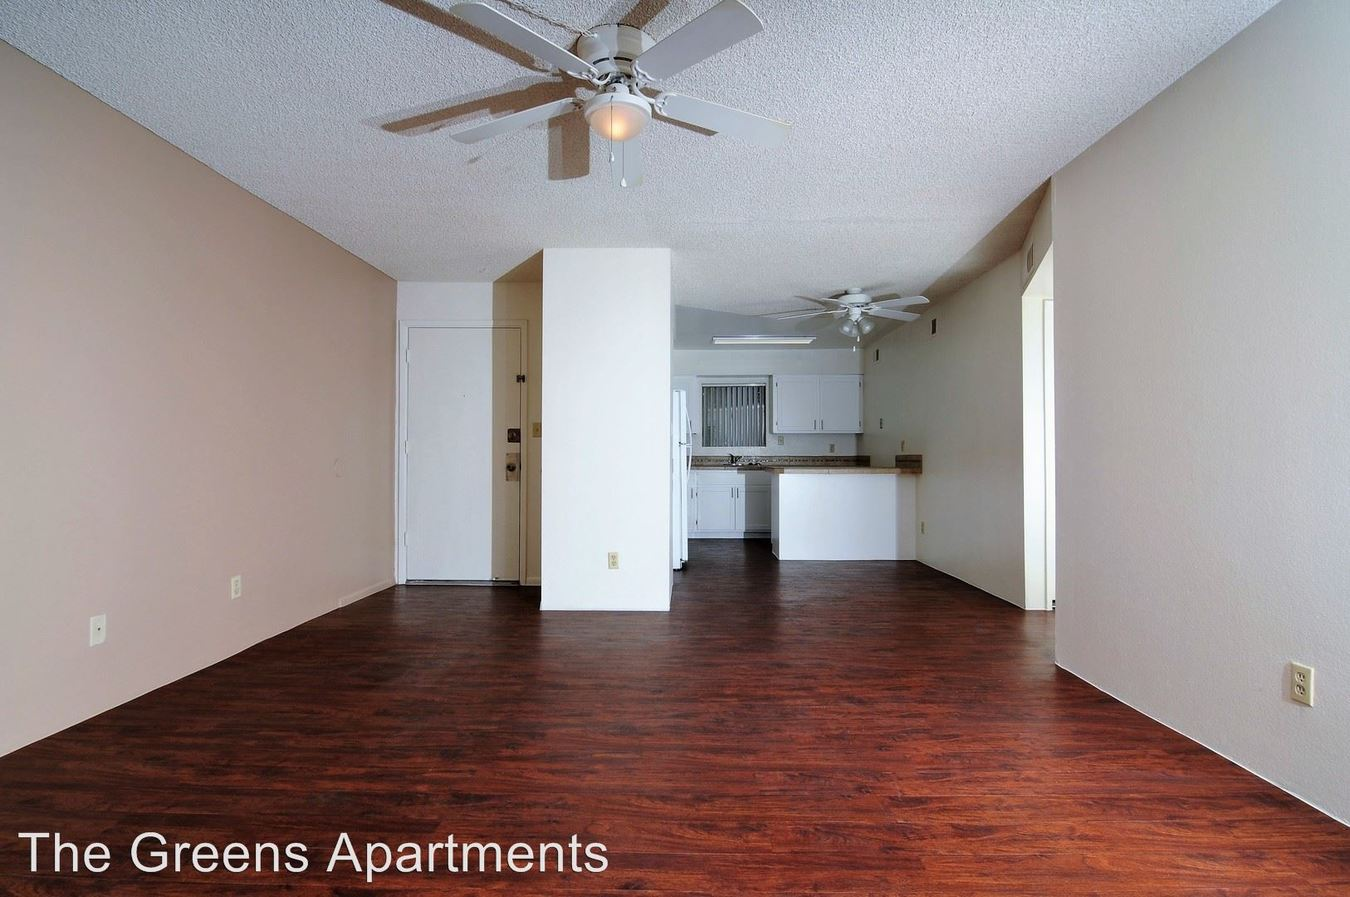 2 Bedrooms 2 Bathrooms Apartment for rent at 8445 North 23rd Avenue in Phoenix, AZ